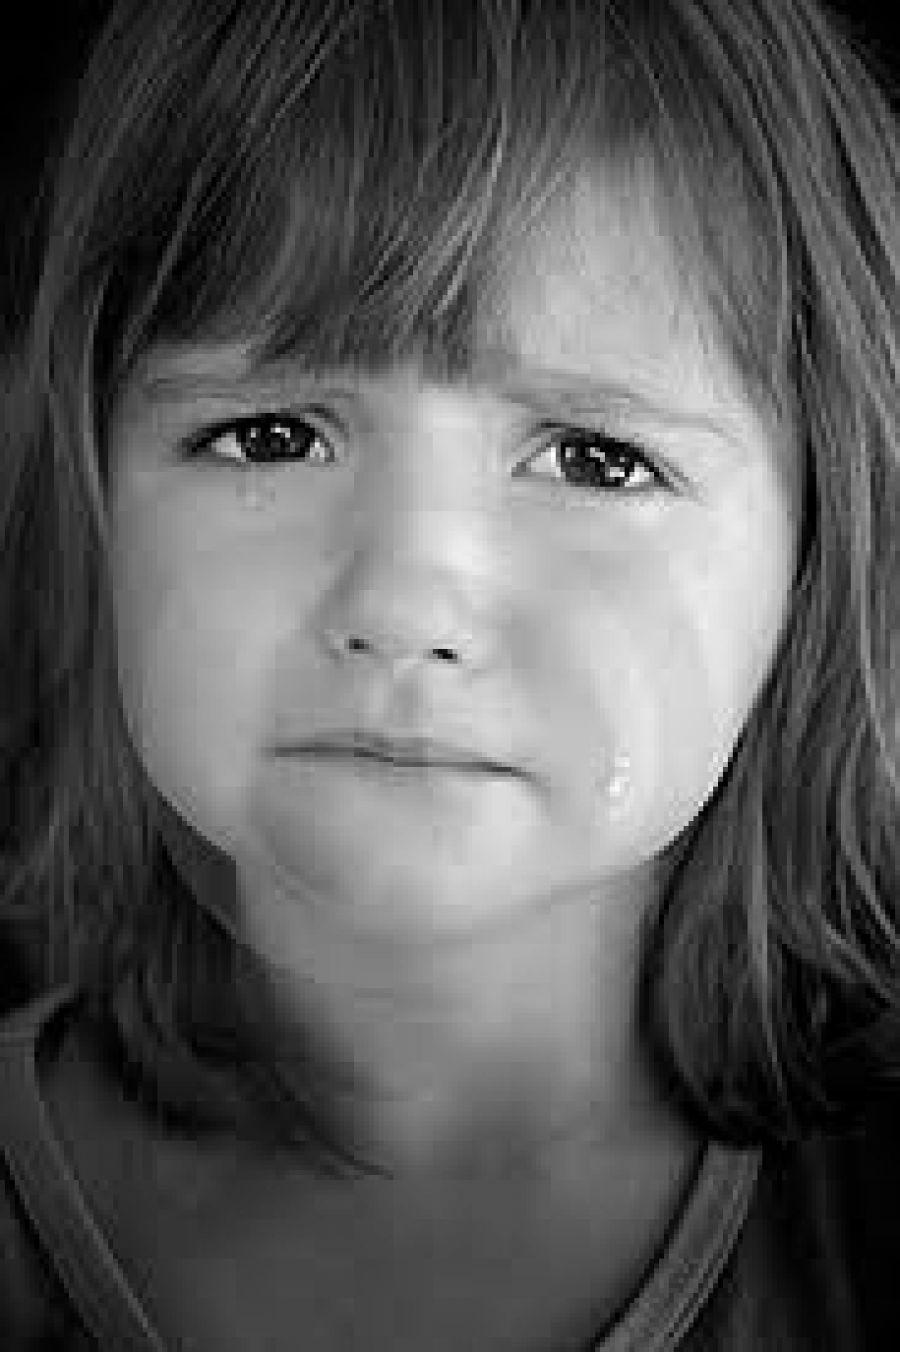 بالصور صور دموع حزينه , فوائد وانواع الدموع 3948 6